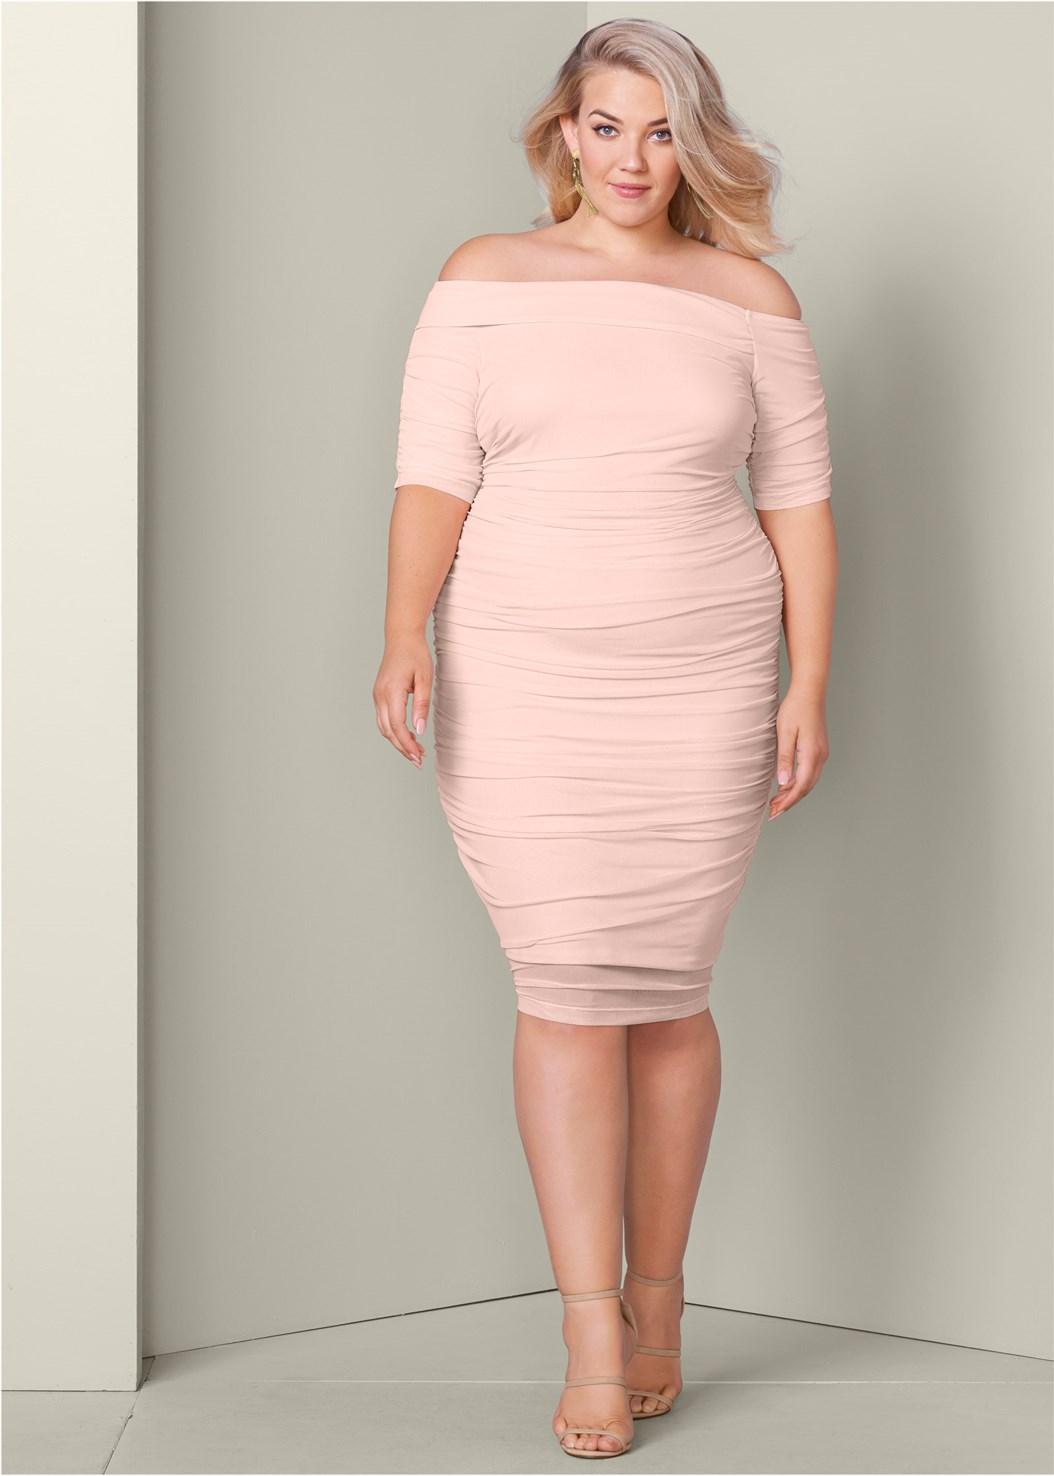 Venus Ruched Mesh Dress